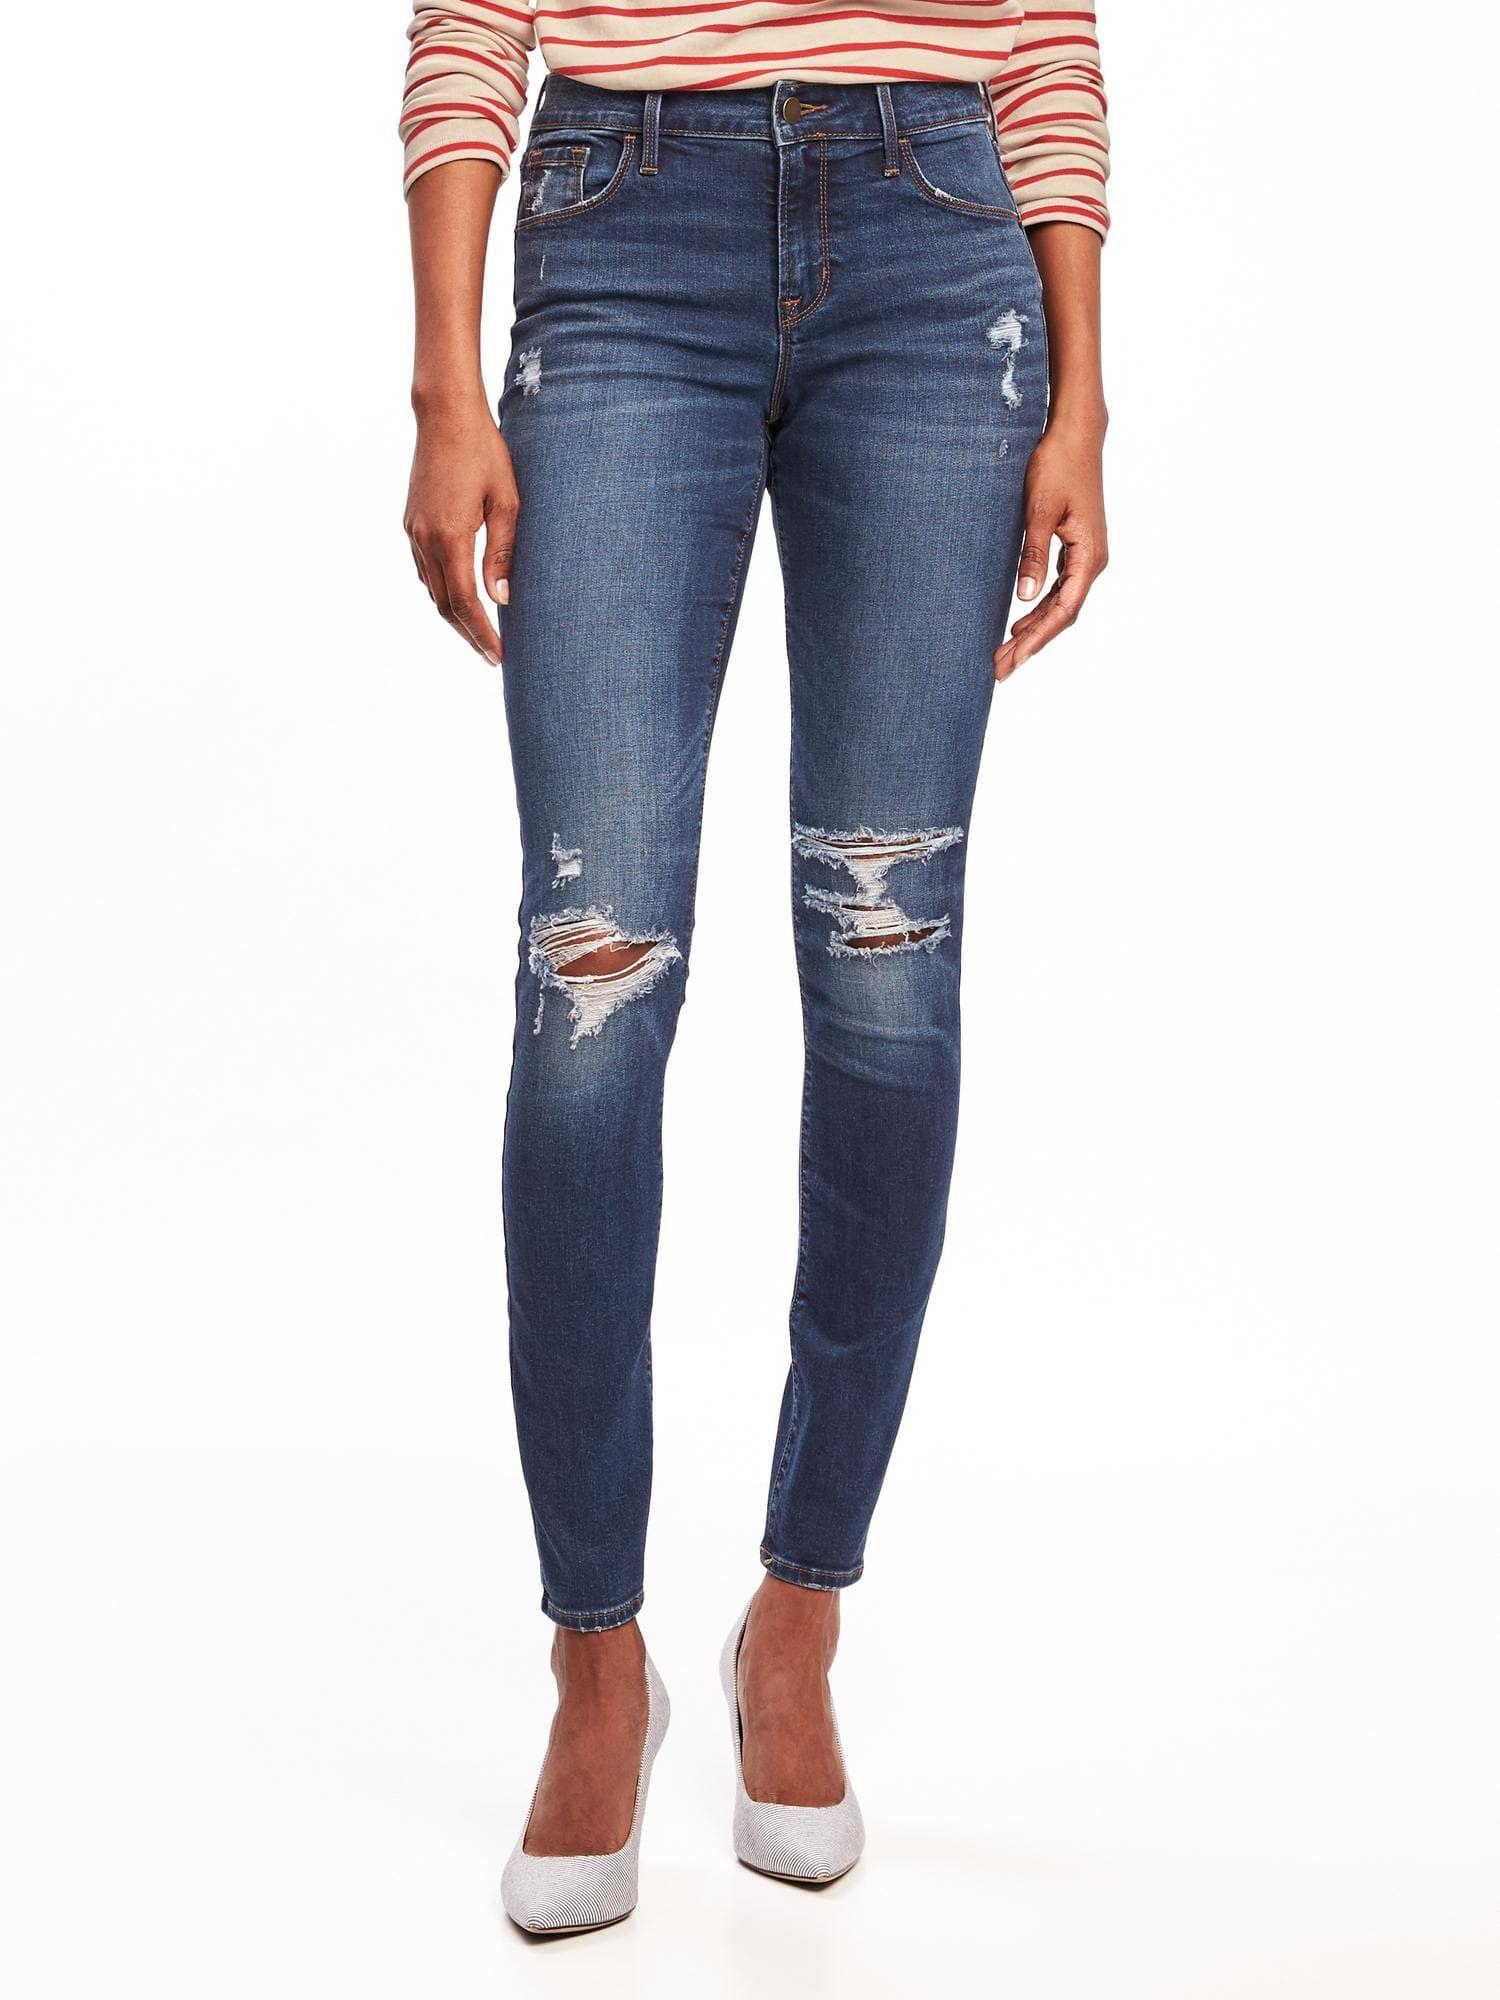 8c3df4da7c1 Mid-Rise Distressed Rockstar Super Skinny Jeans for Women